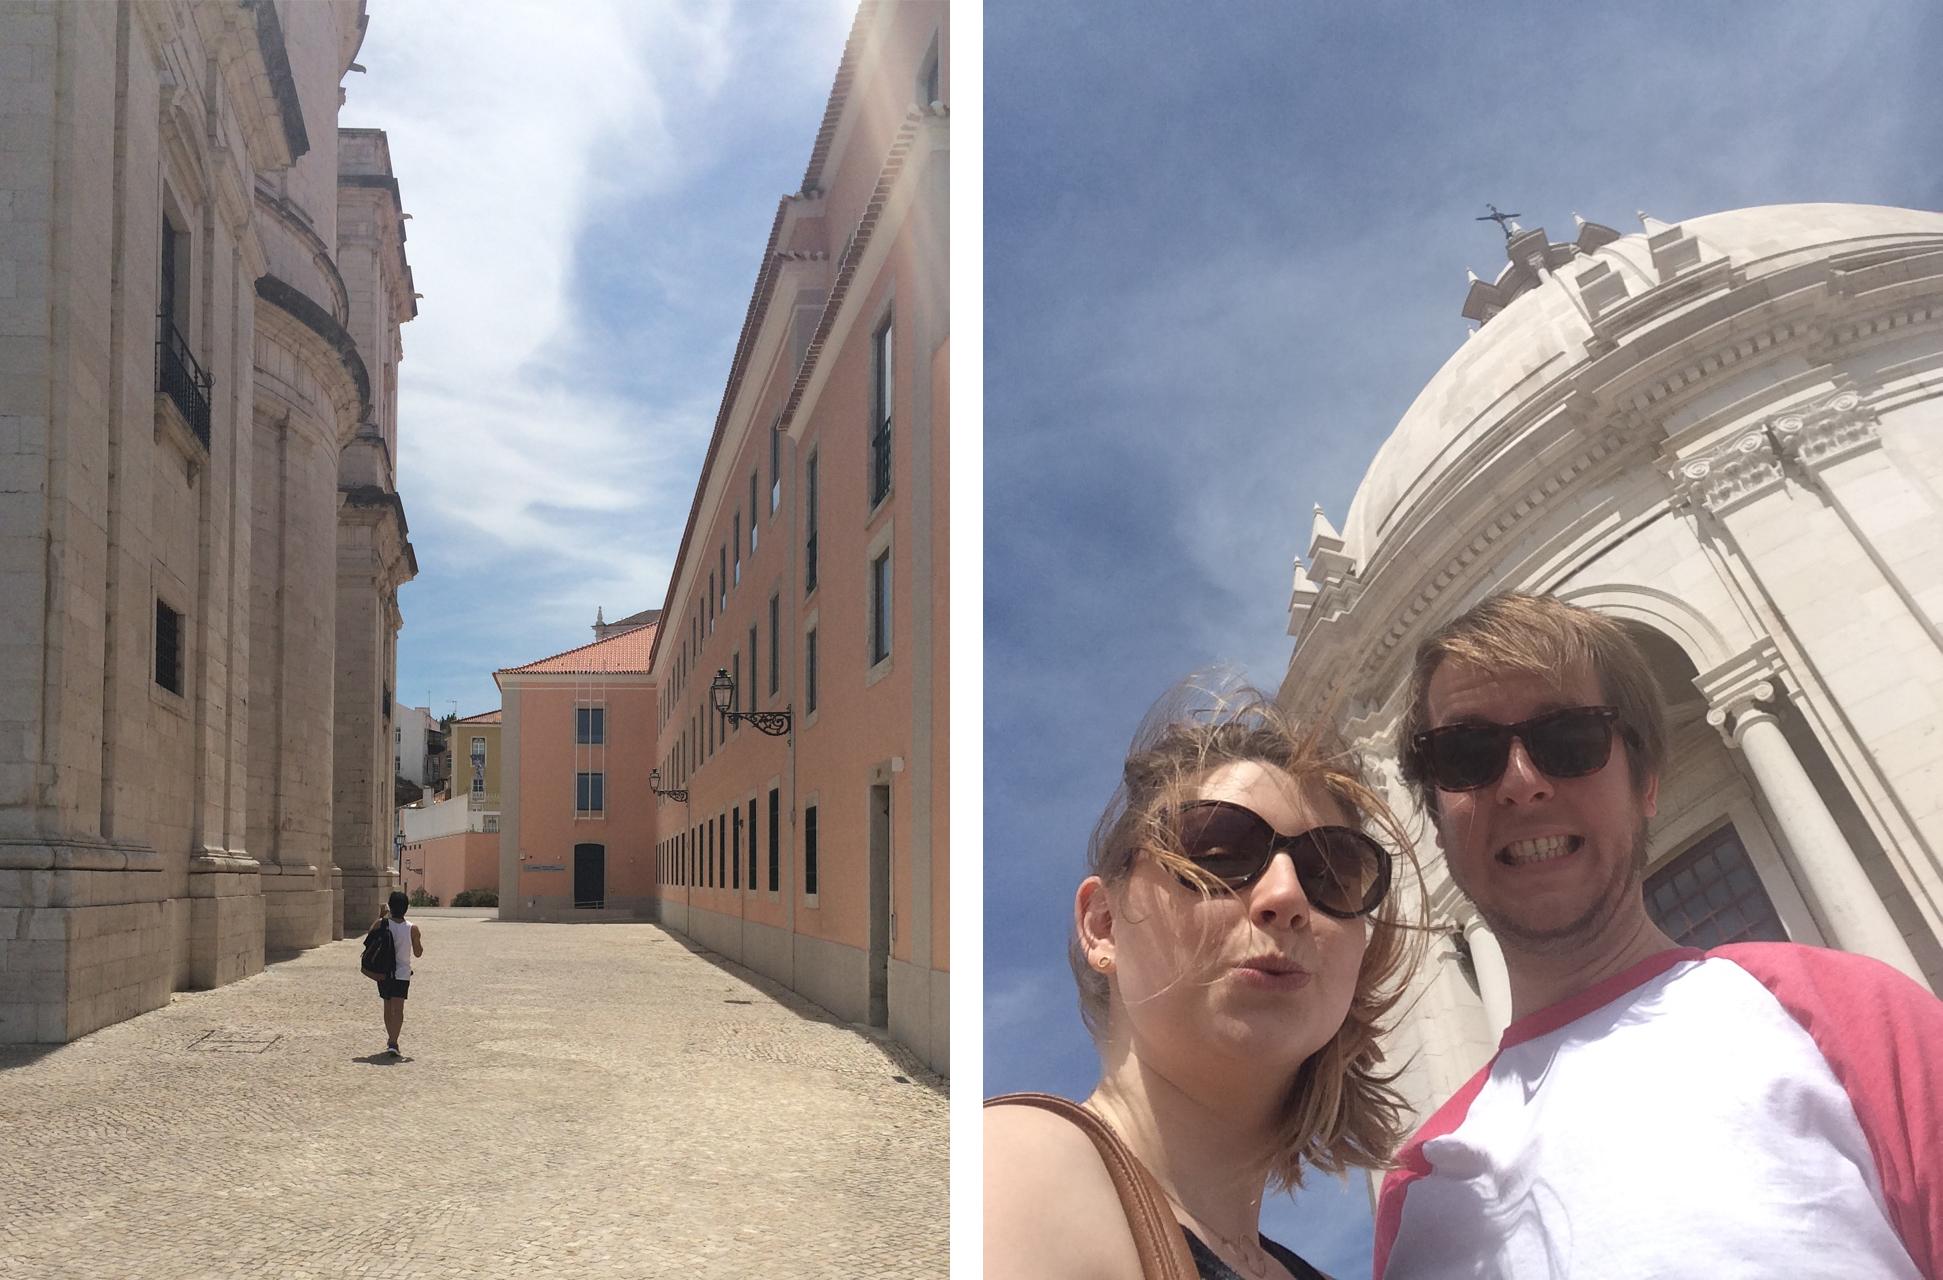 basilica selfie